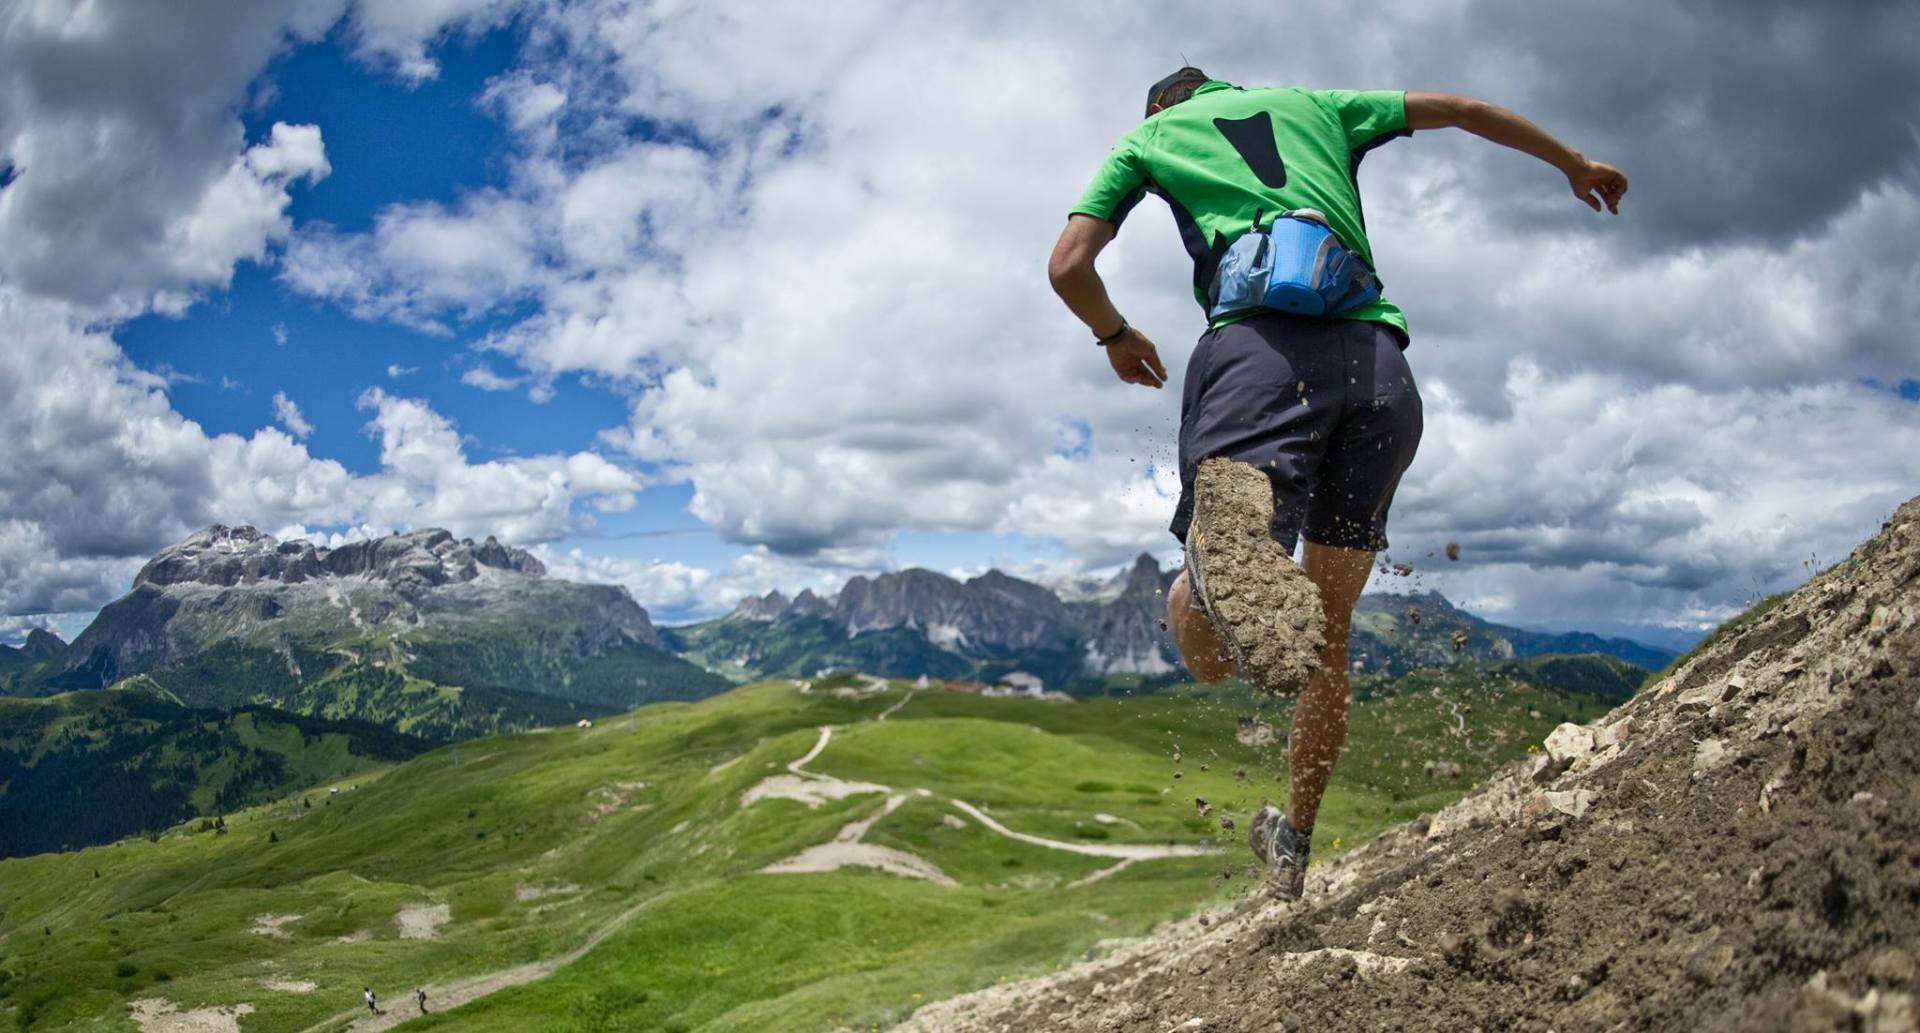 Alergări montane